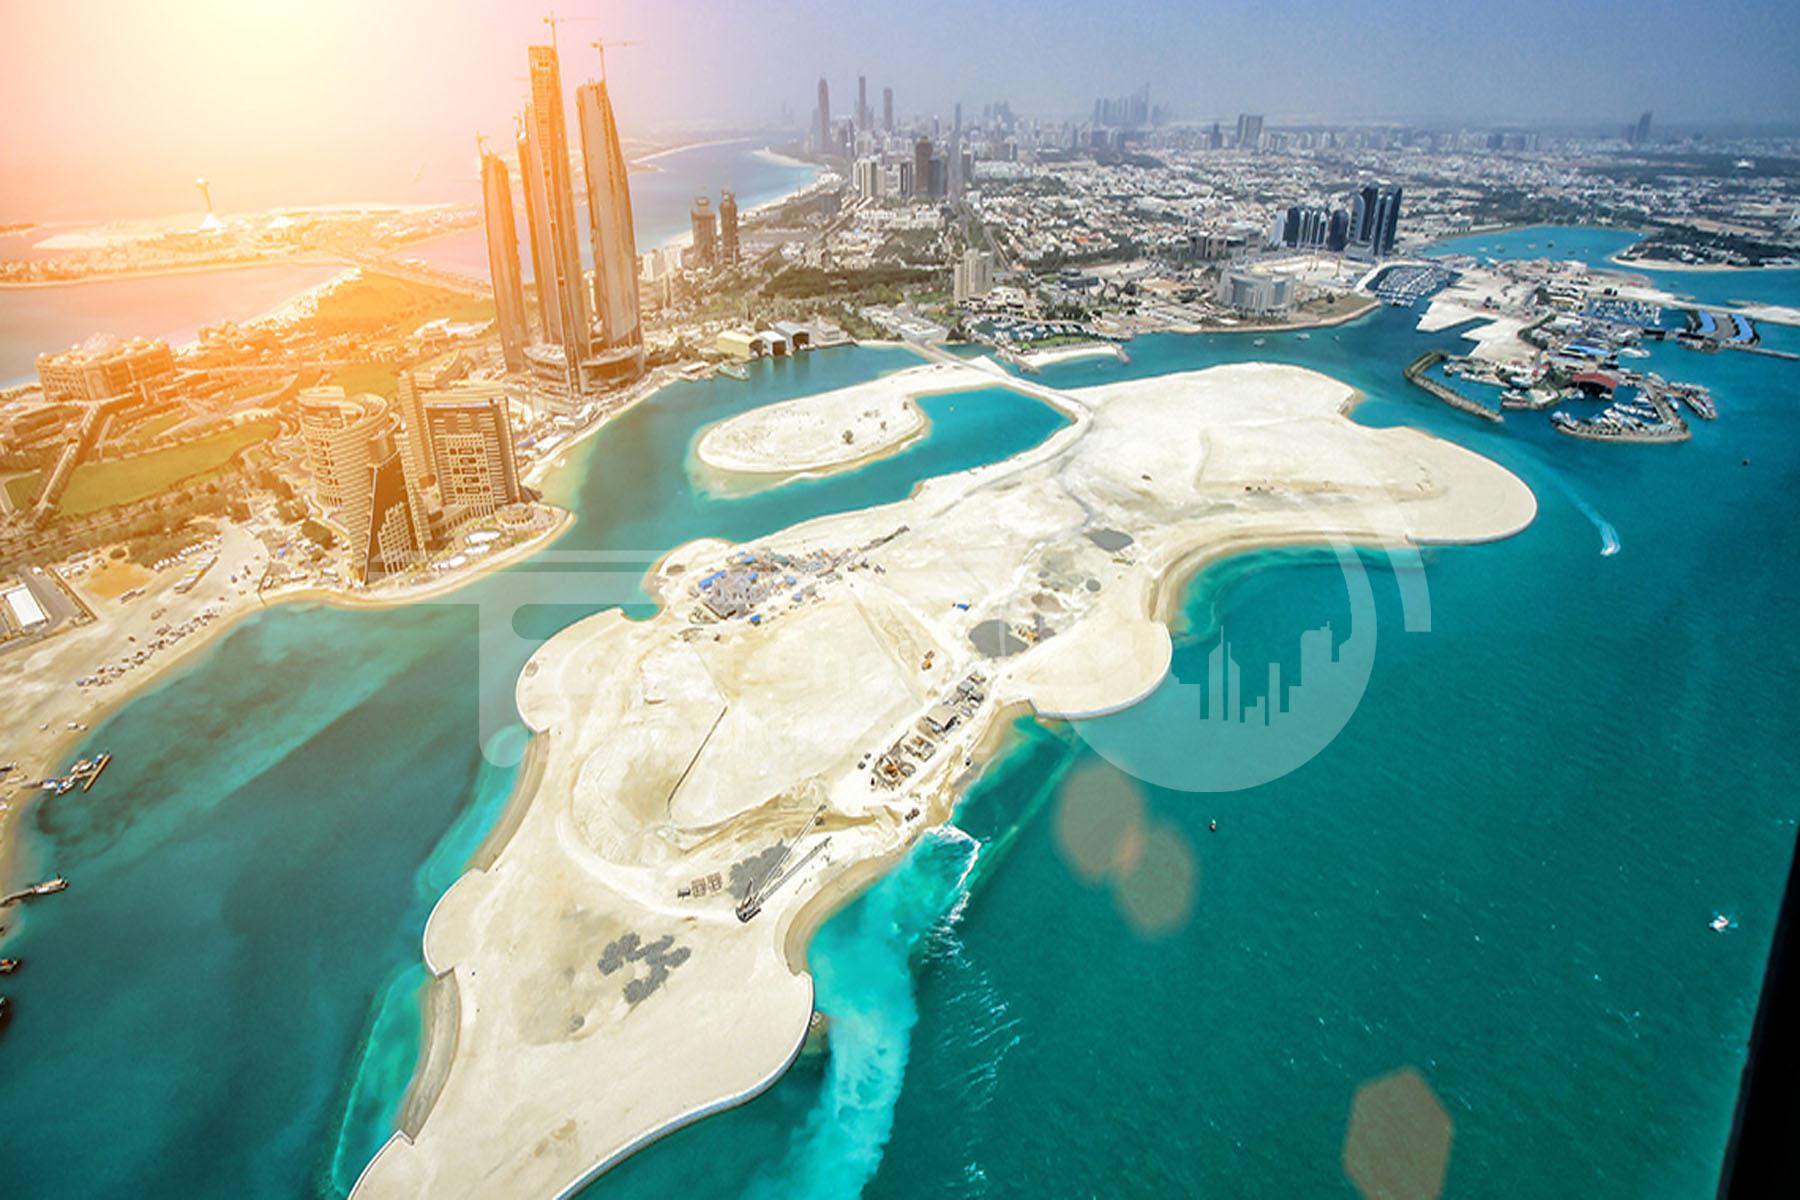 Residential Island - Nareel Island - Al Bateen - Abu Dhabi - UAE (13).jpg